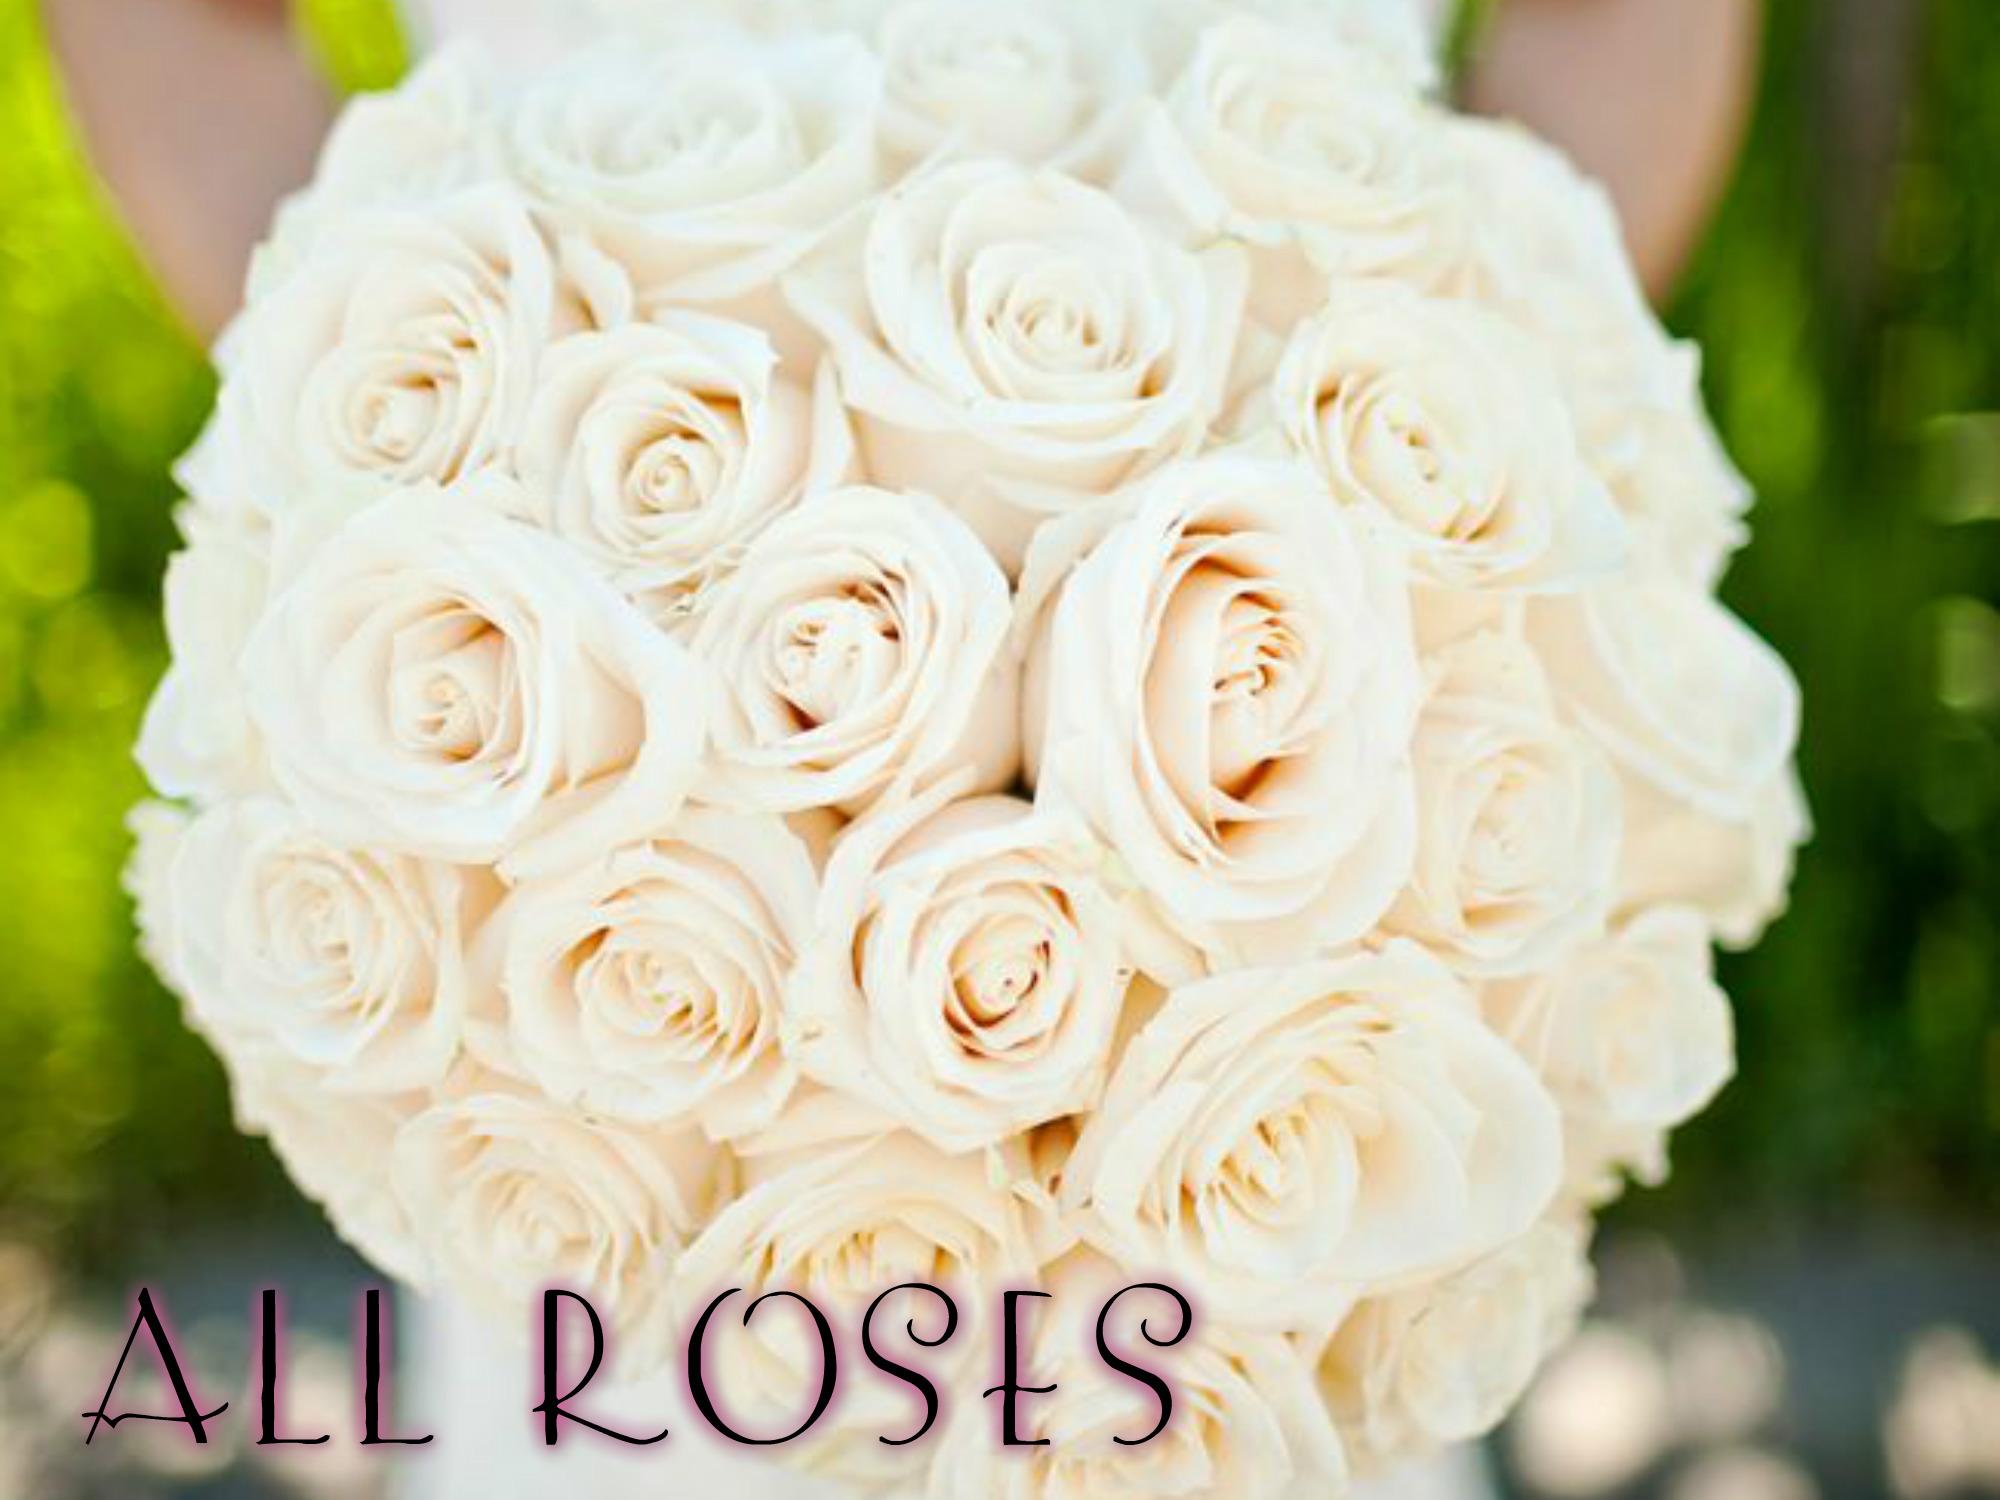 pizap.com all rose.jpg